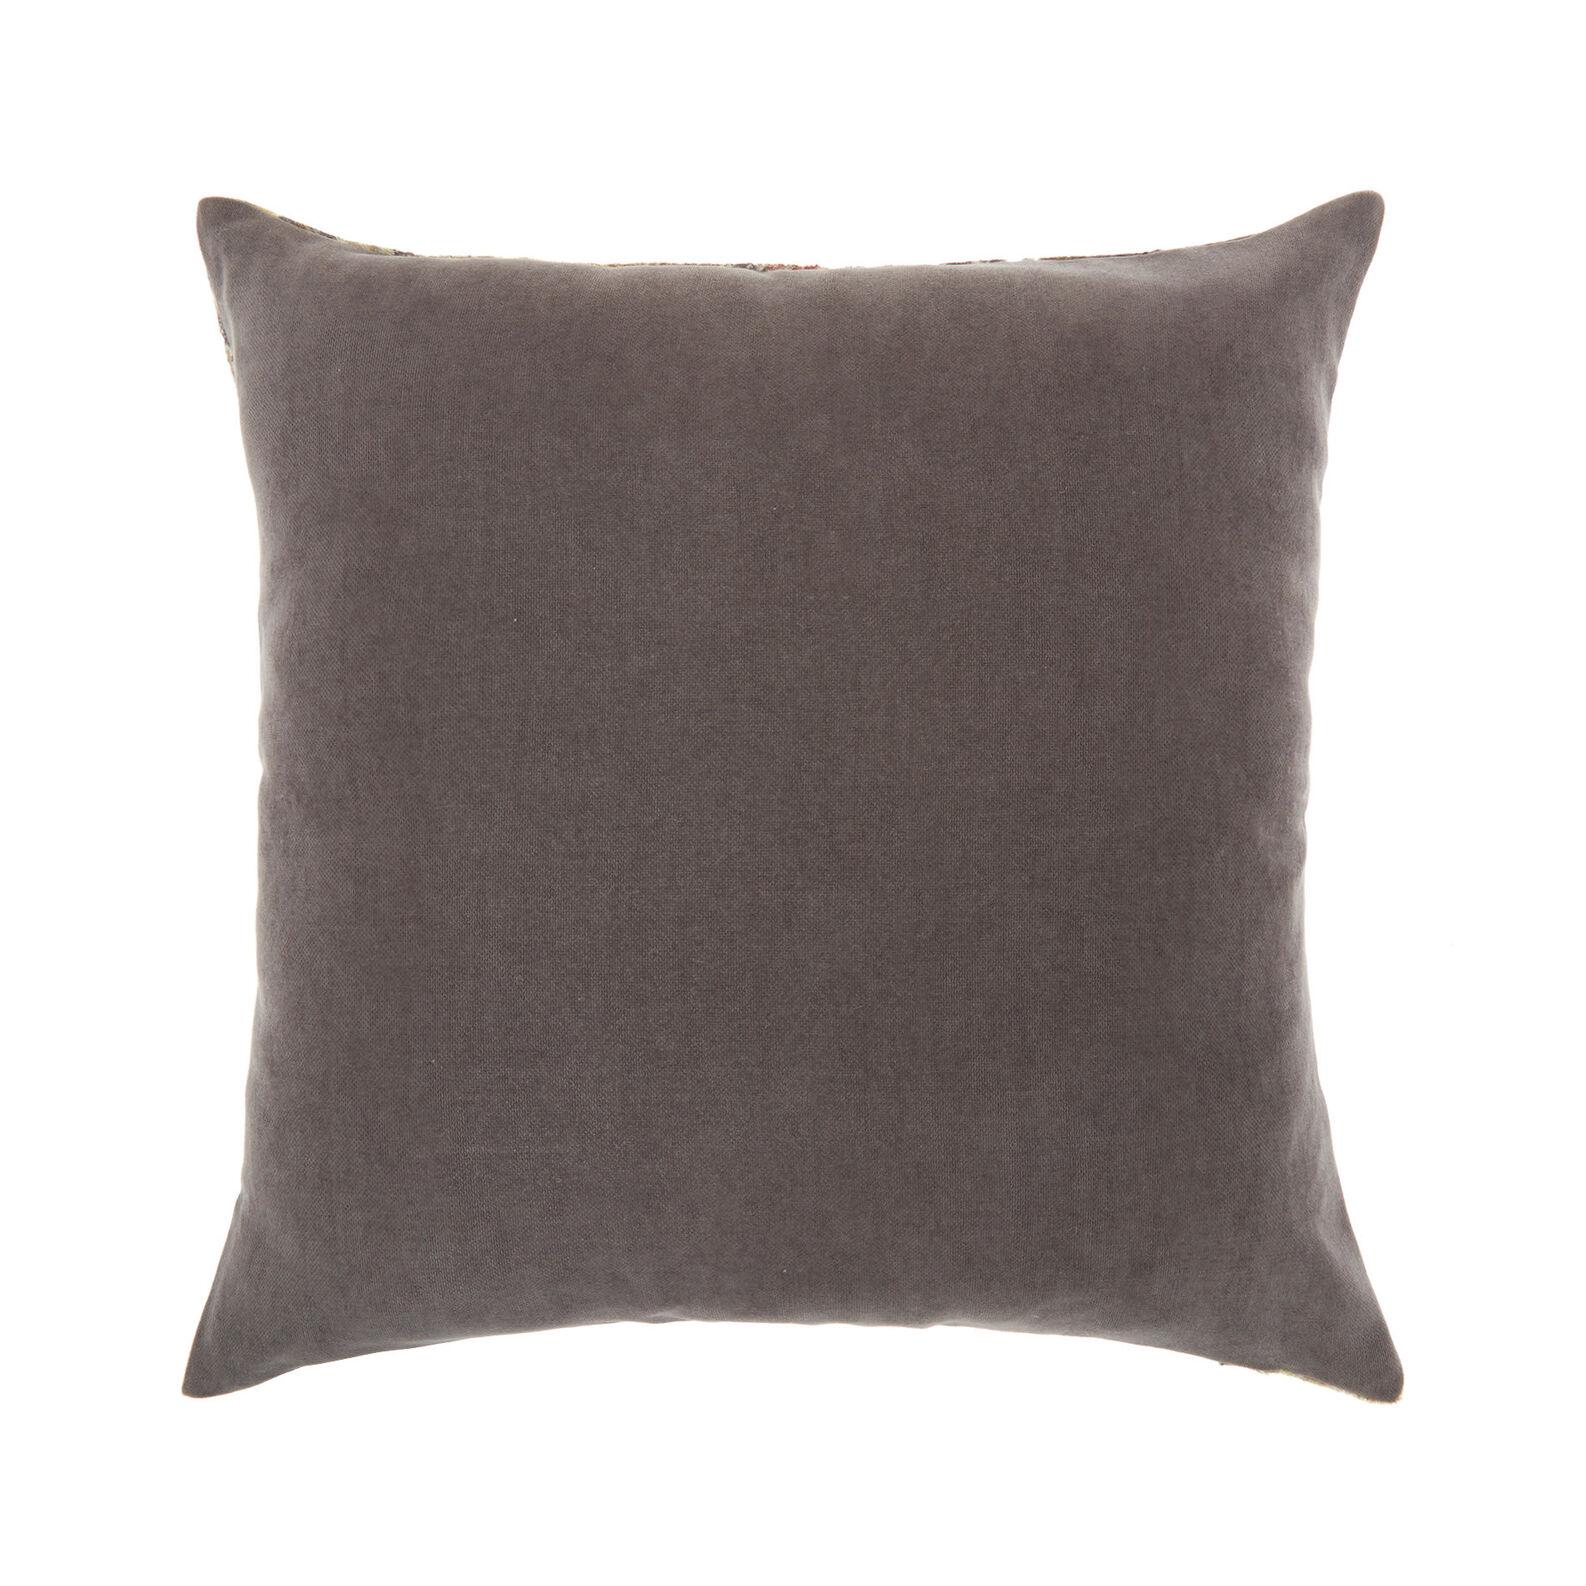 Velvet cushion with vintage effect (45x45cm)